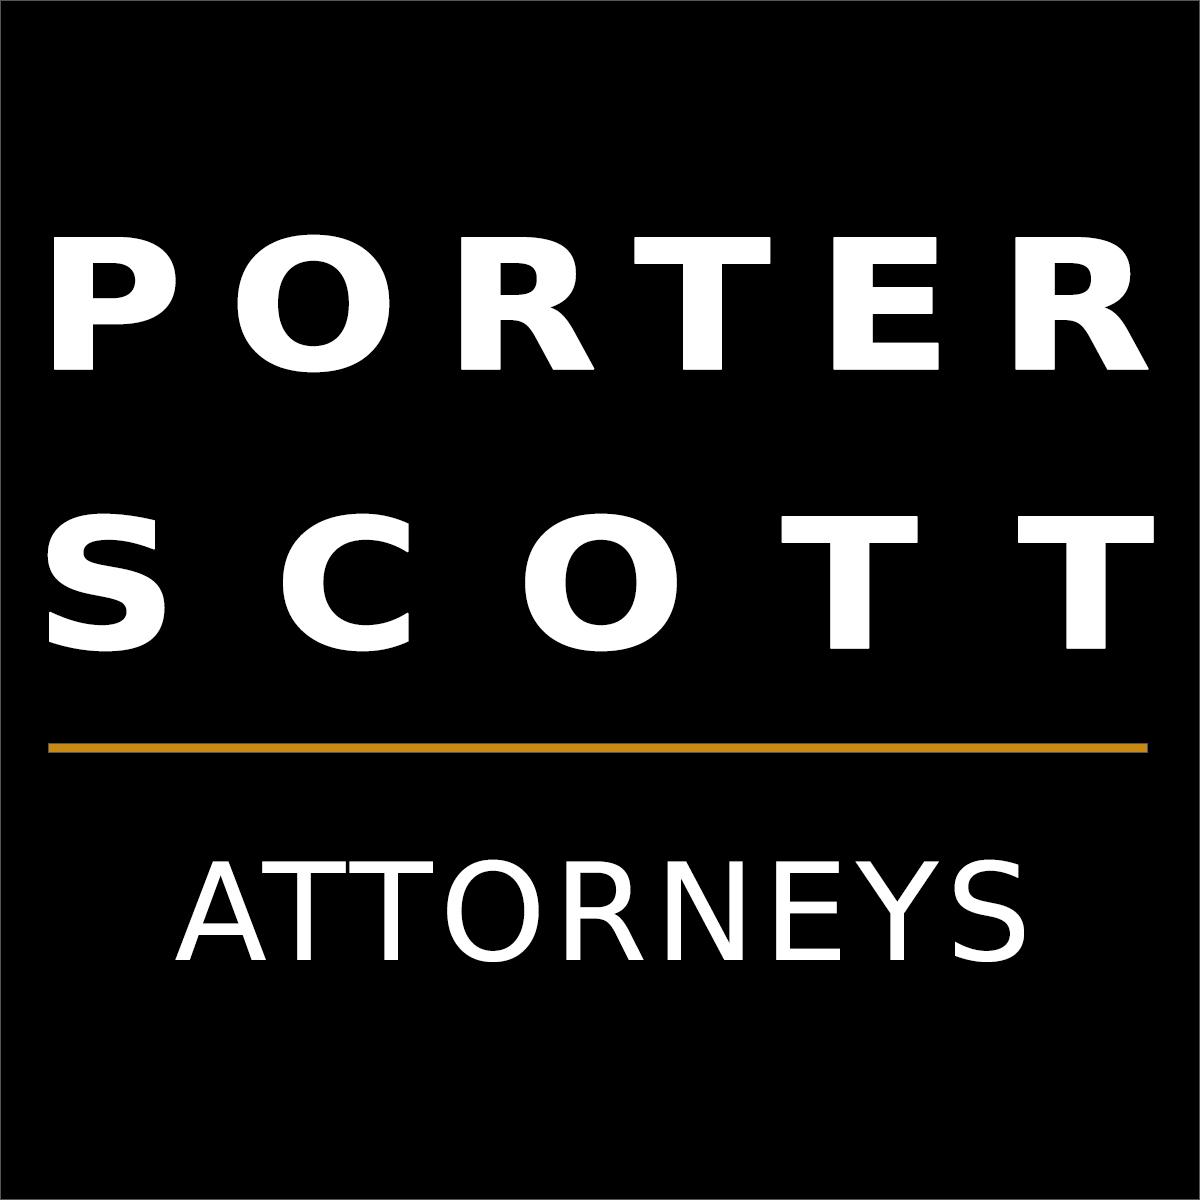 PorterScott